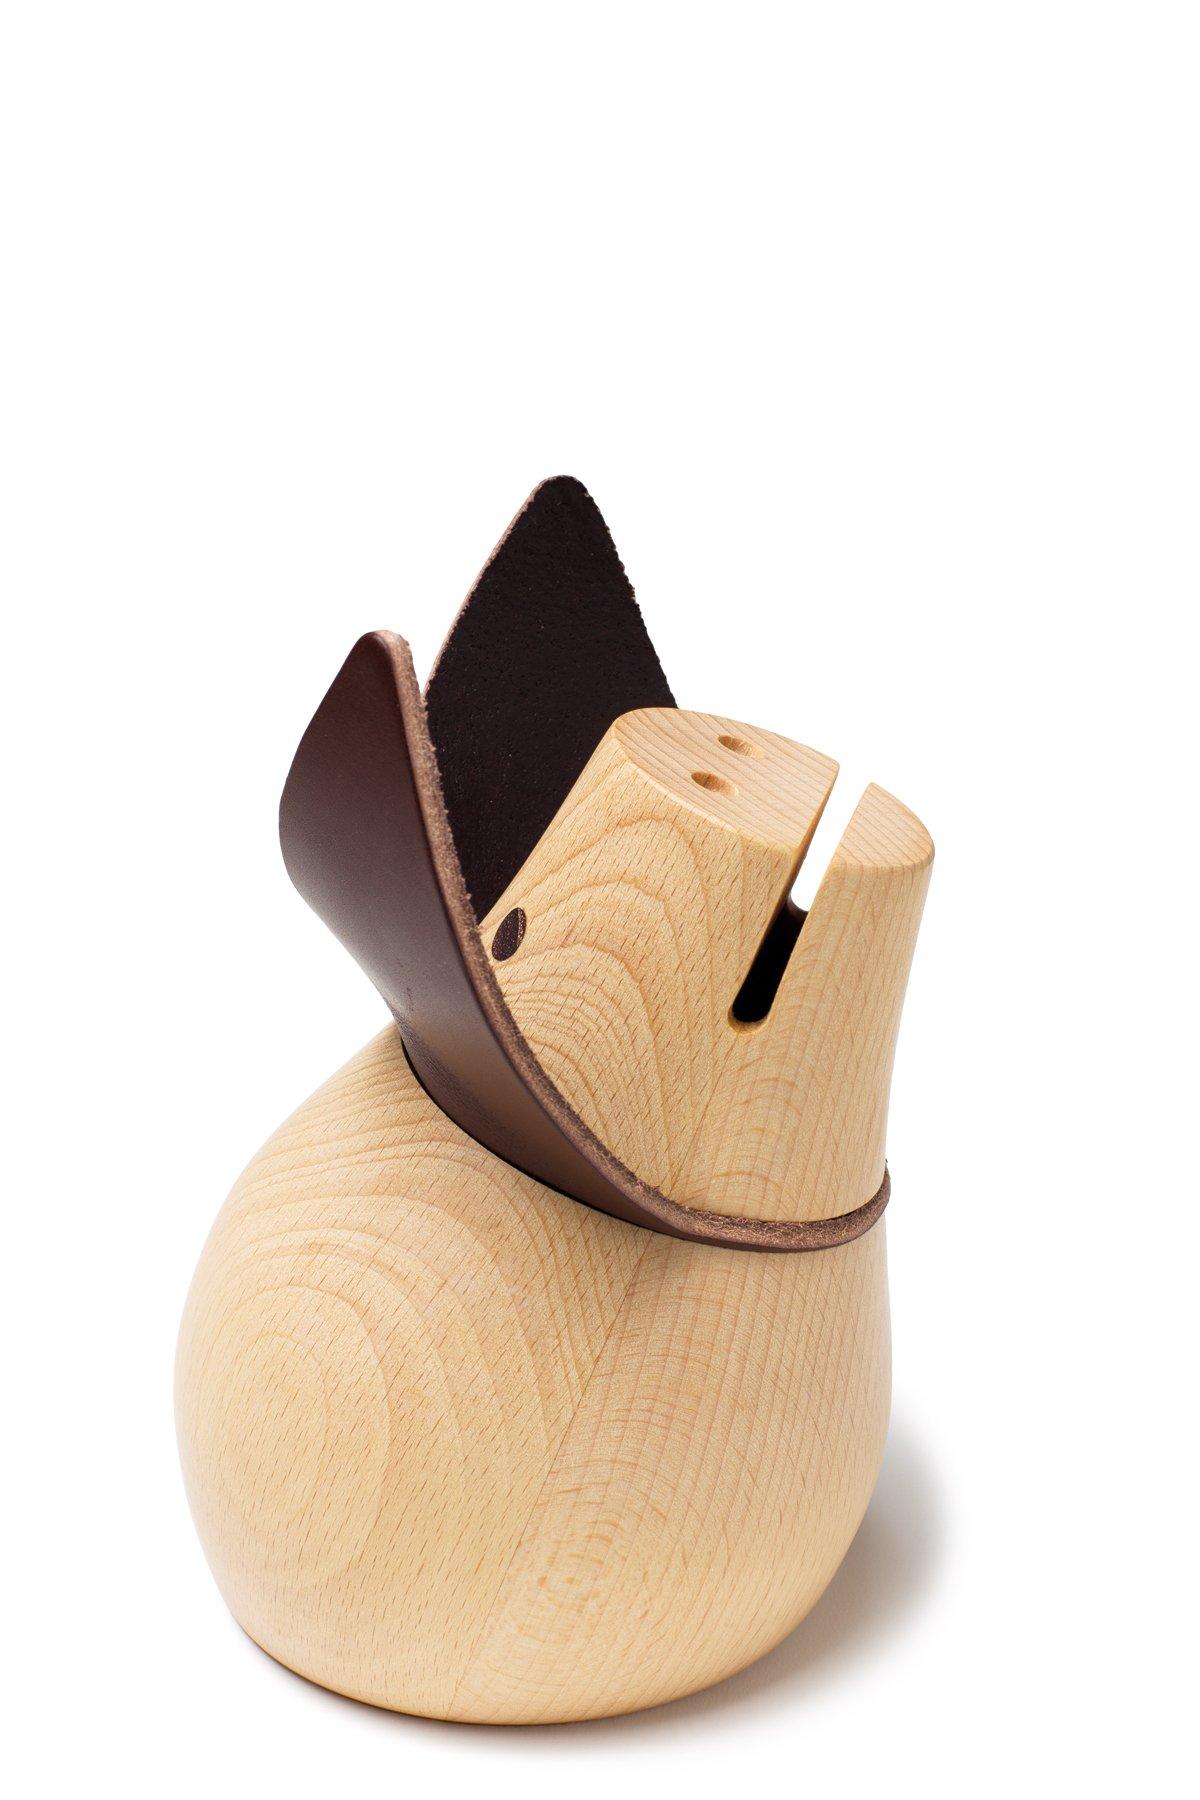 Miss Monnipenni, Wood Piggy Bank -25718